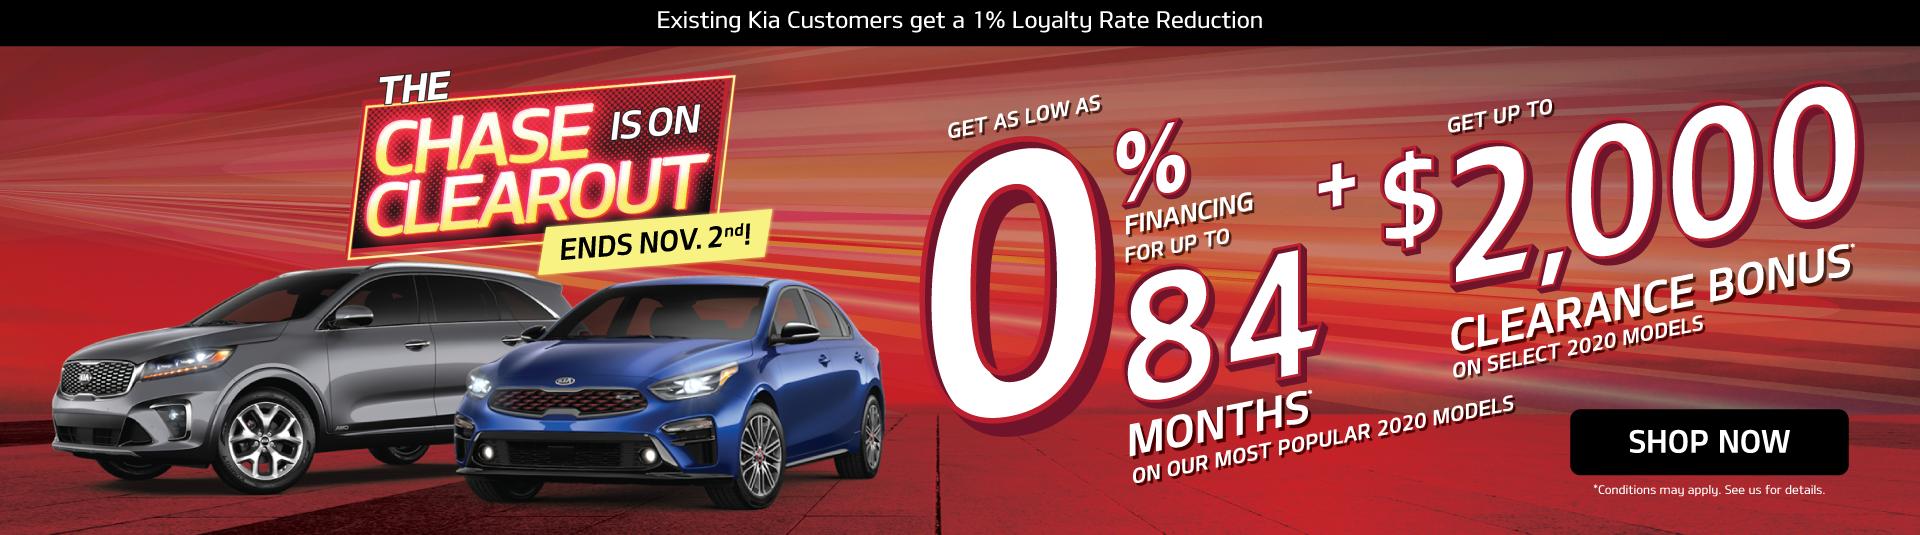 Kia The Chase is On Mississauga Kia - Kia Deals and Offers